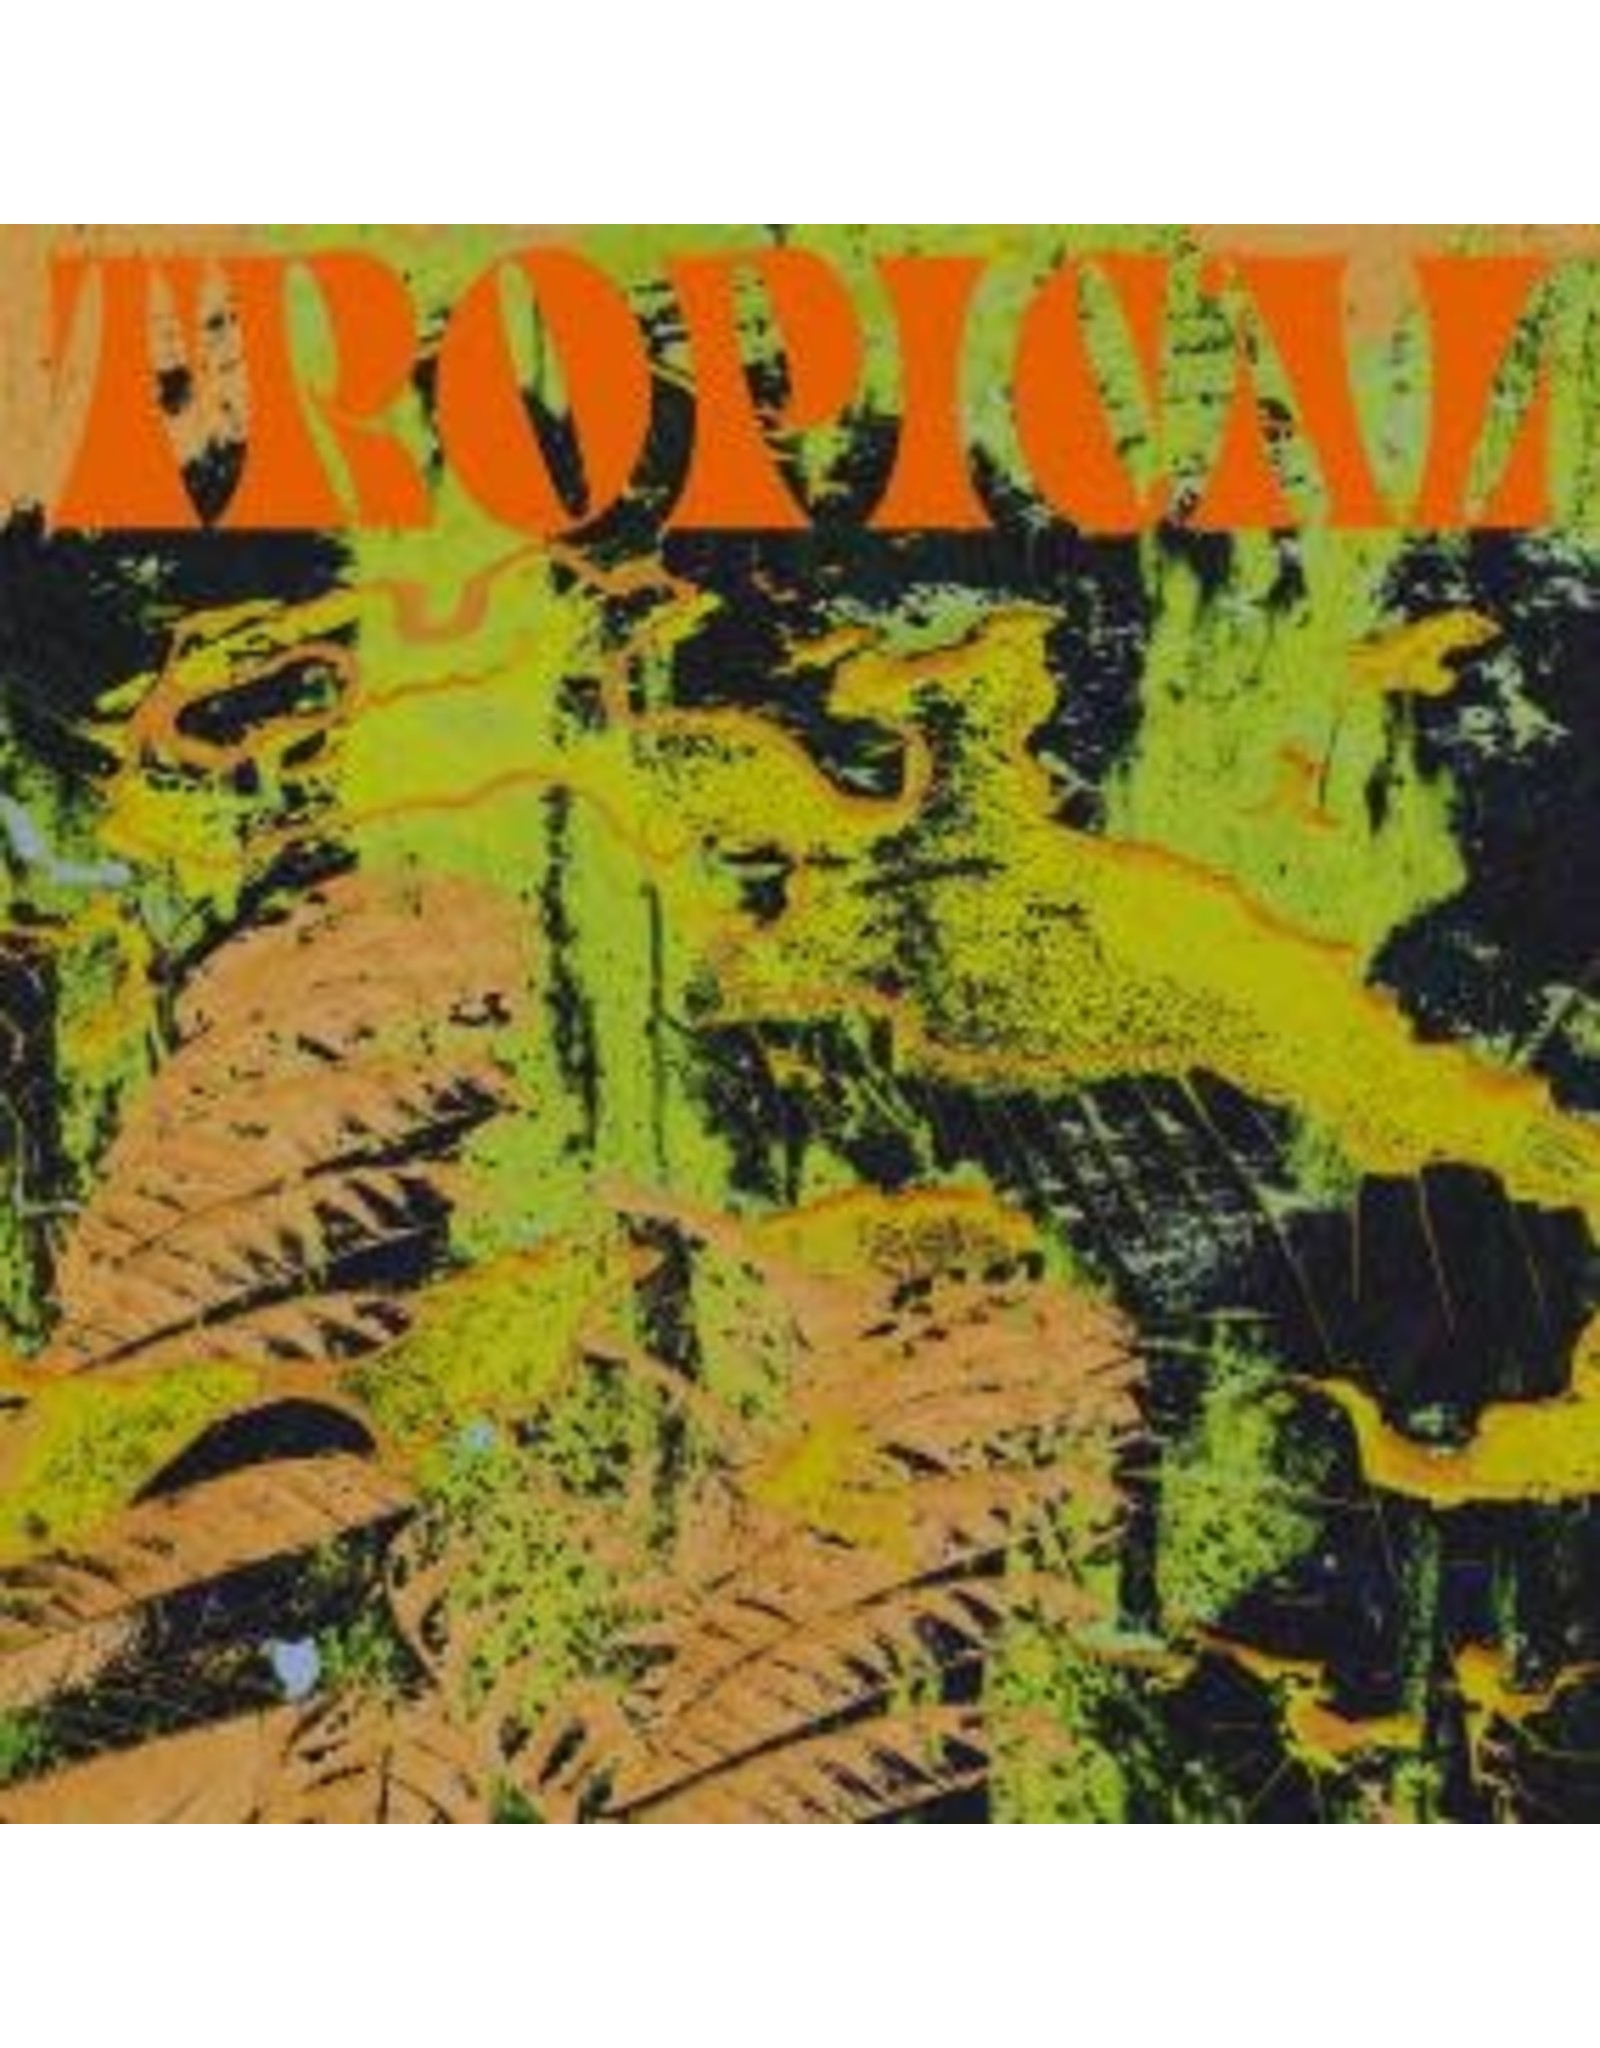 South of North CV Vision: Tropical LP